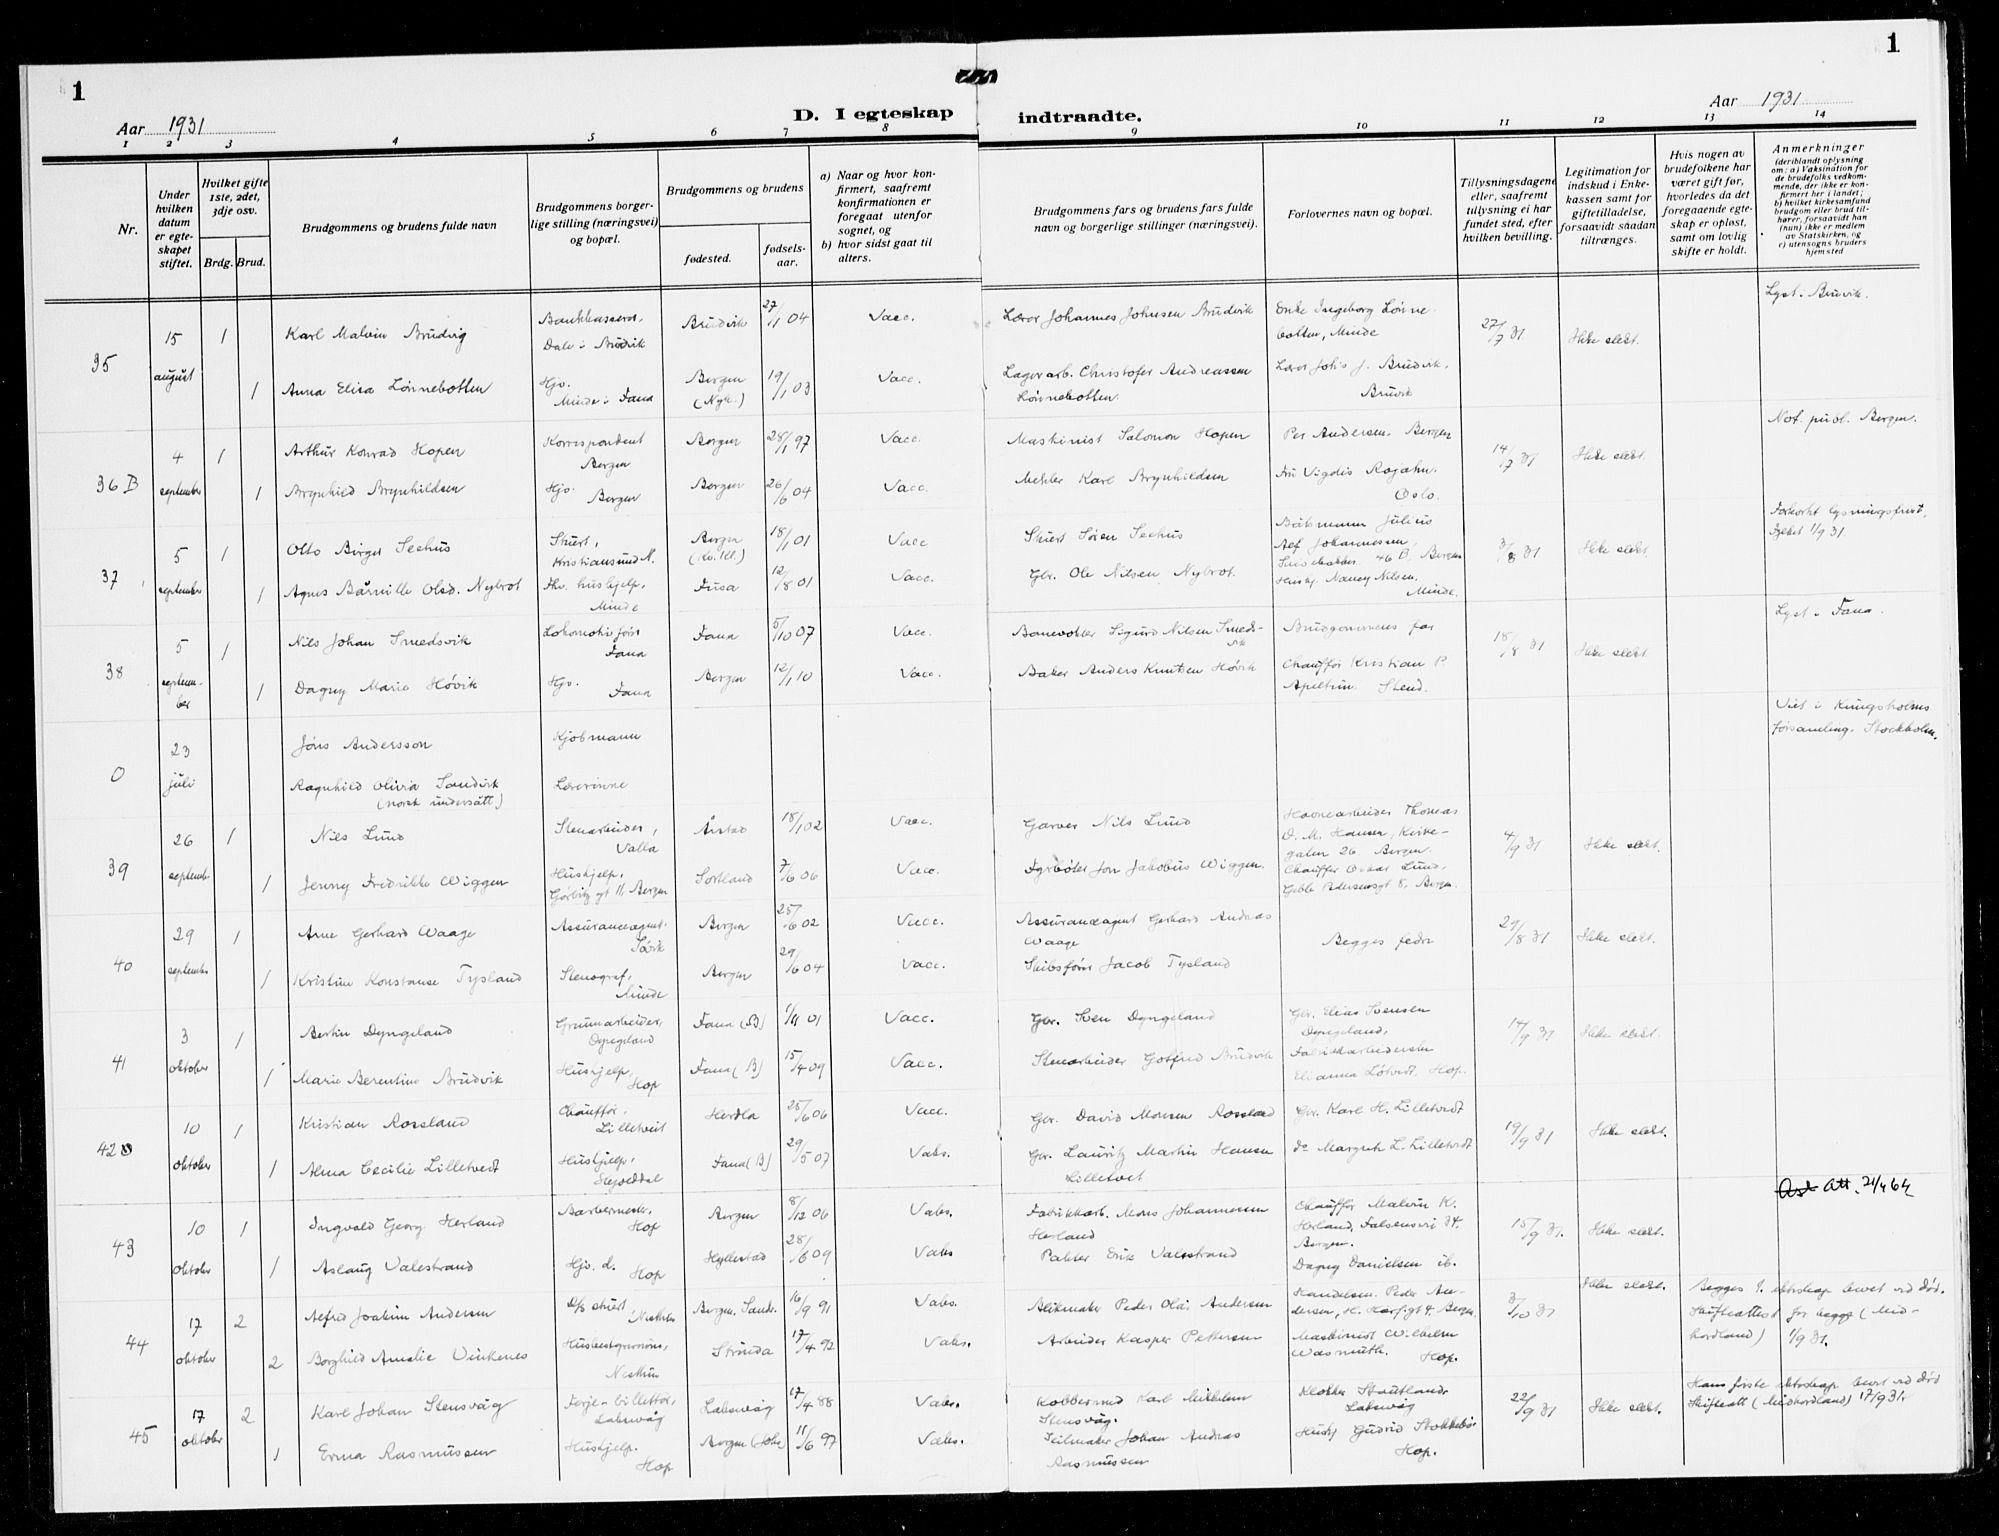 SAB, Fana Sokneprestembete, H/Haa/Haak/L0002: Ministerialbok nr. K 2, 1931-1938, s. 1